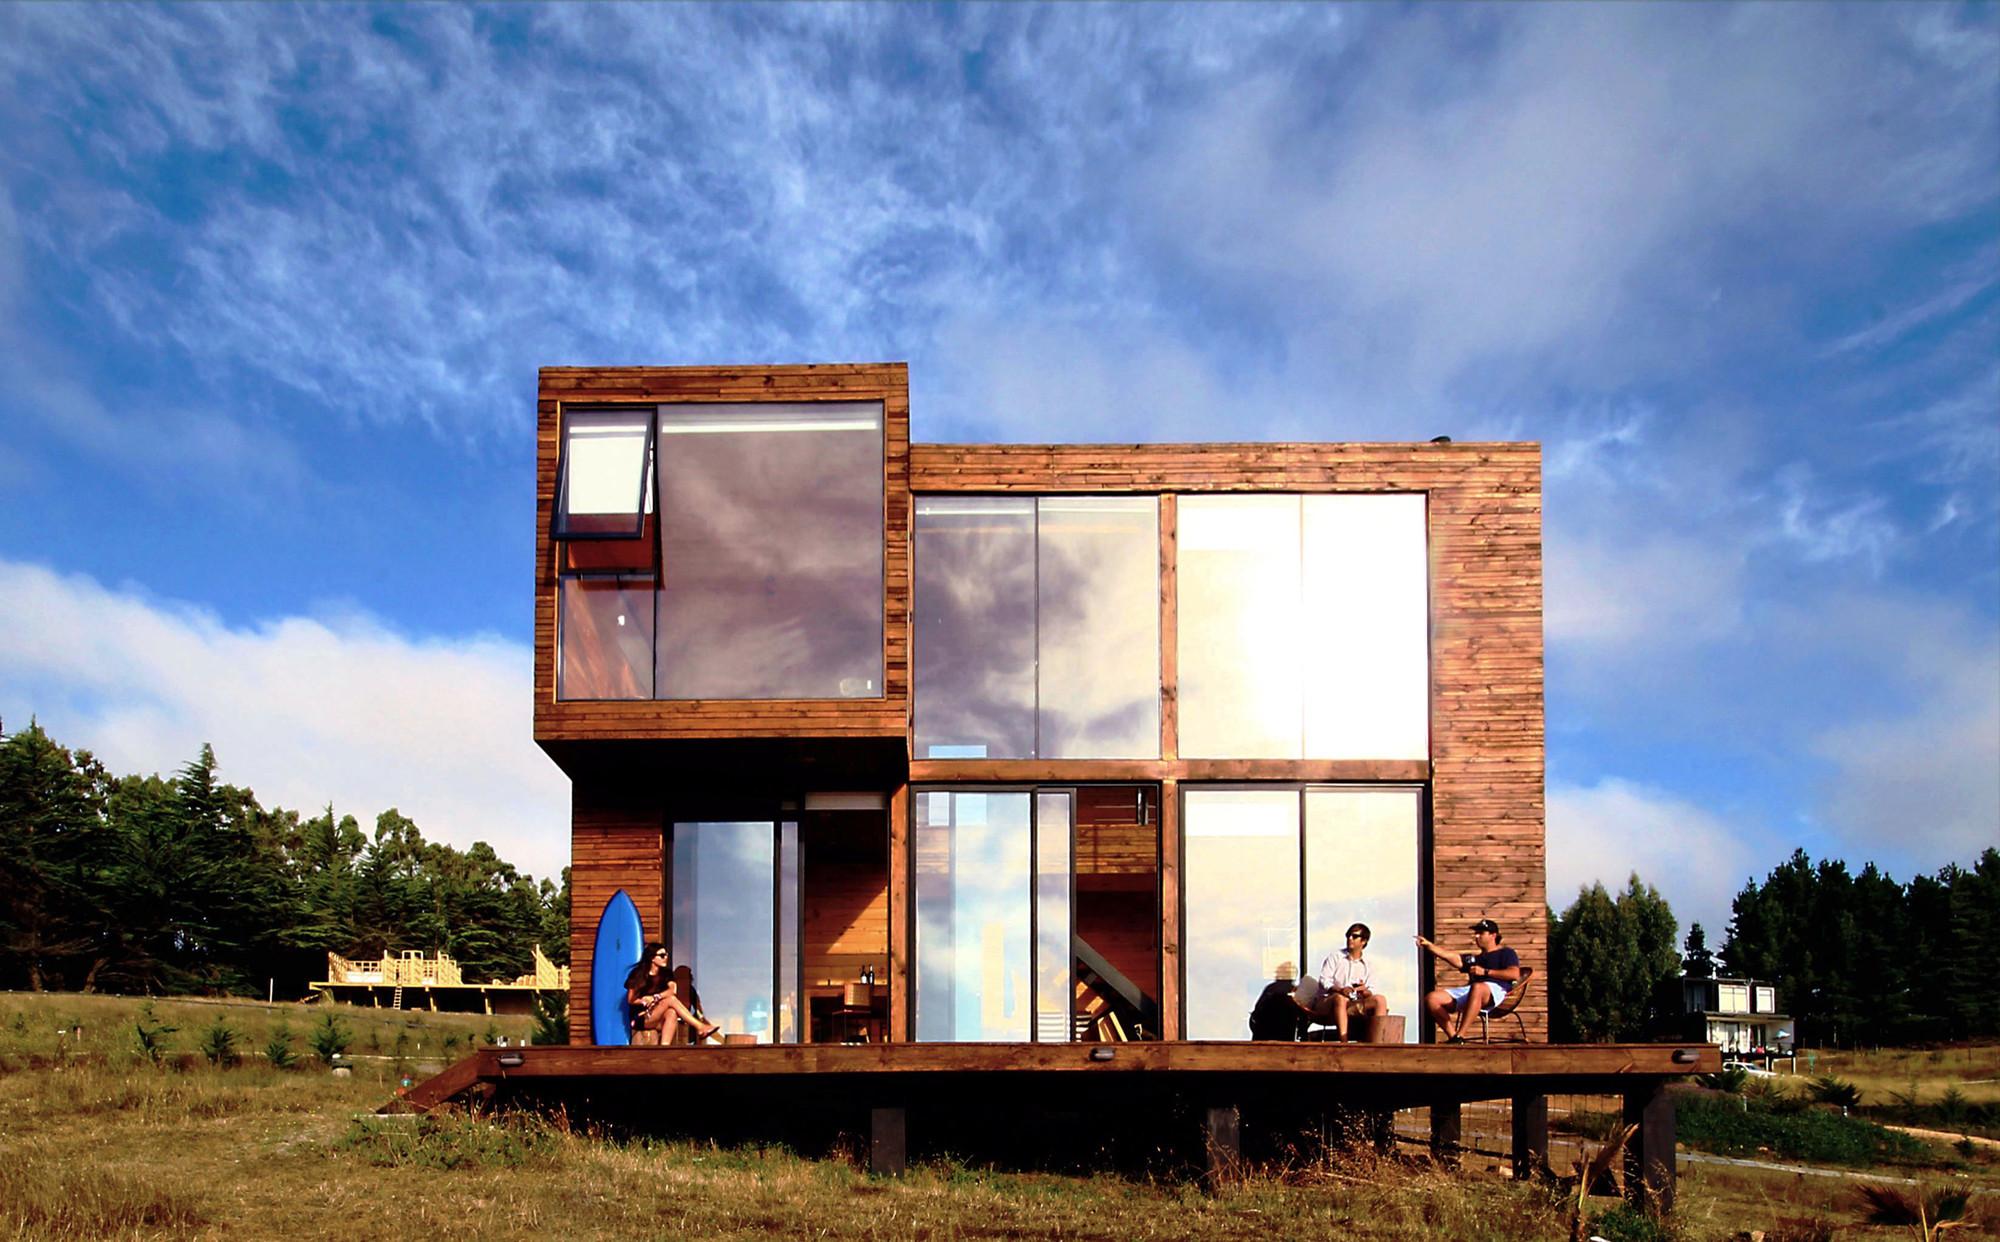 Galeria de casa h paarq arquitectos 15 for Casa de arquitectos